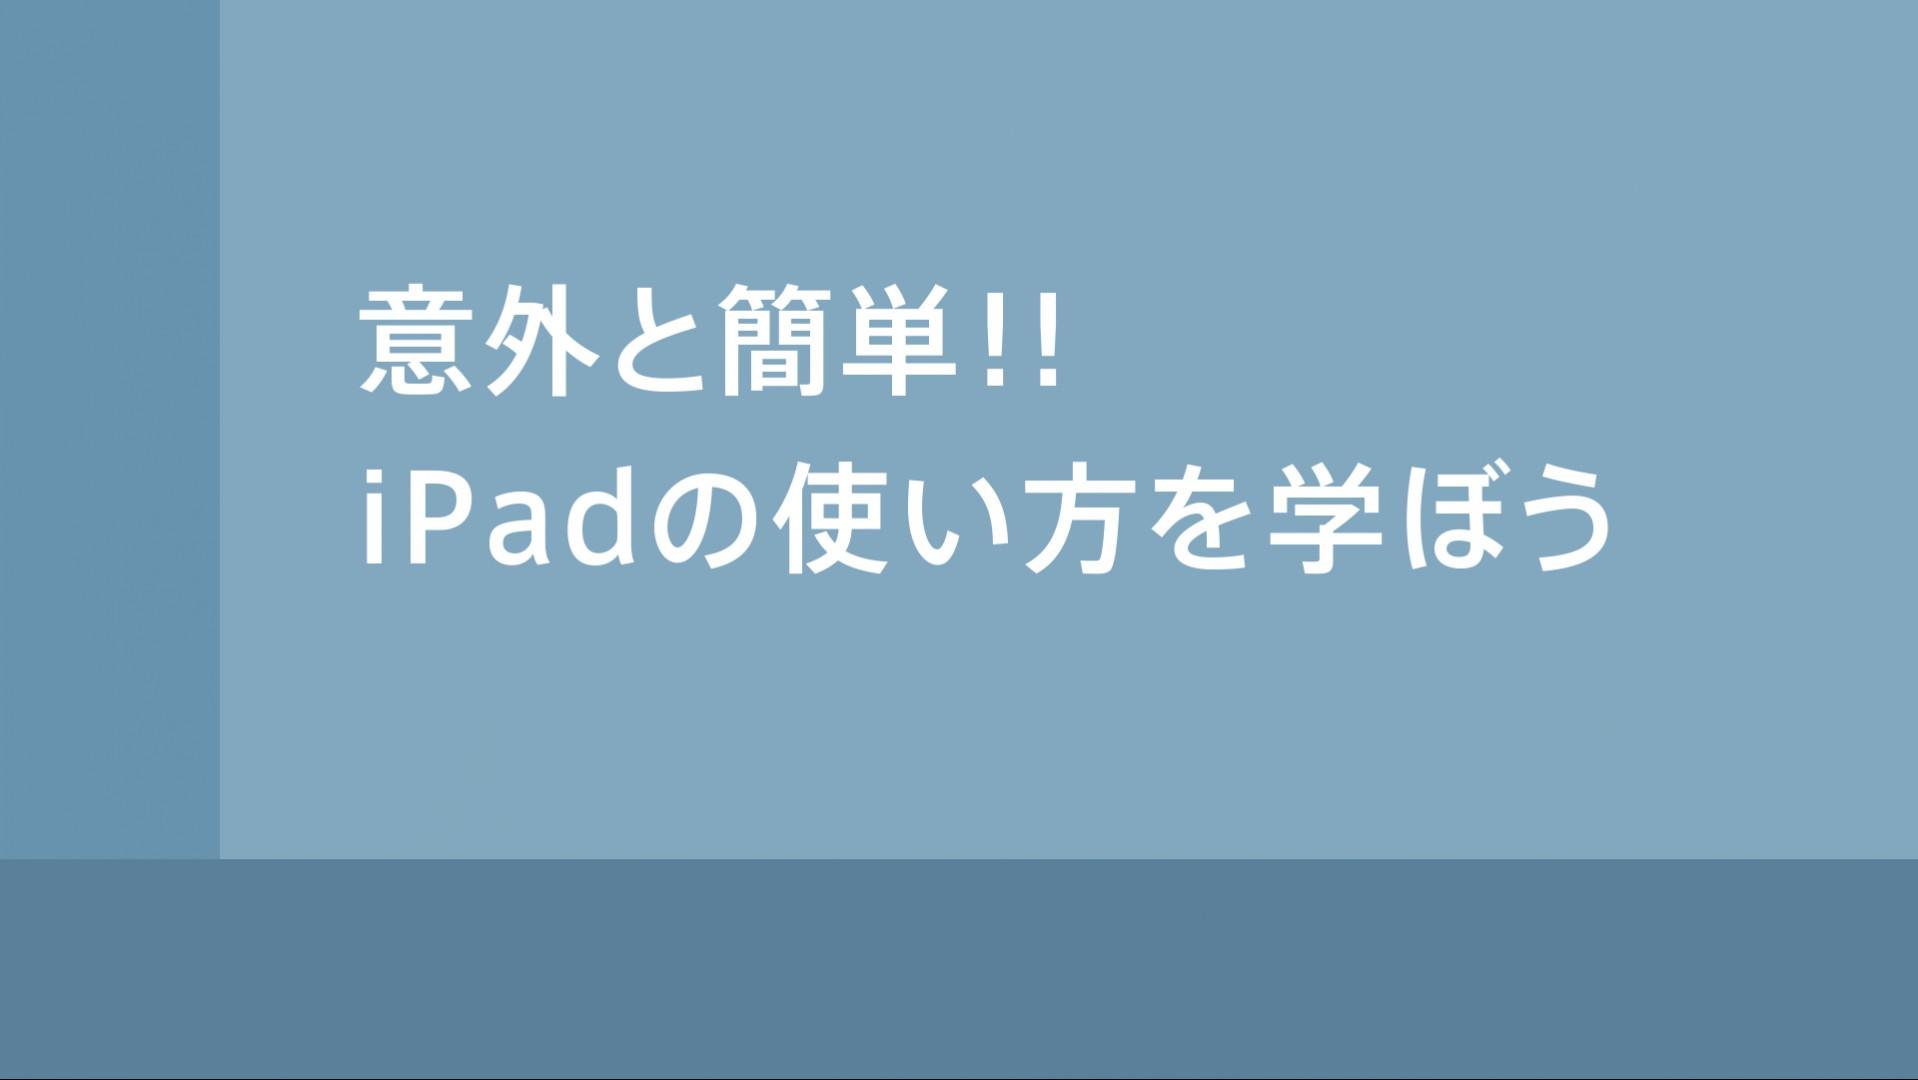 iPad 使い方 時計を使ってアラームを設定する iPad mini編